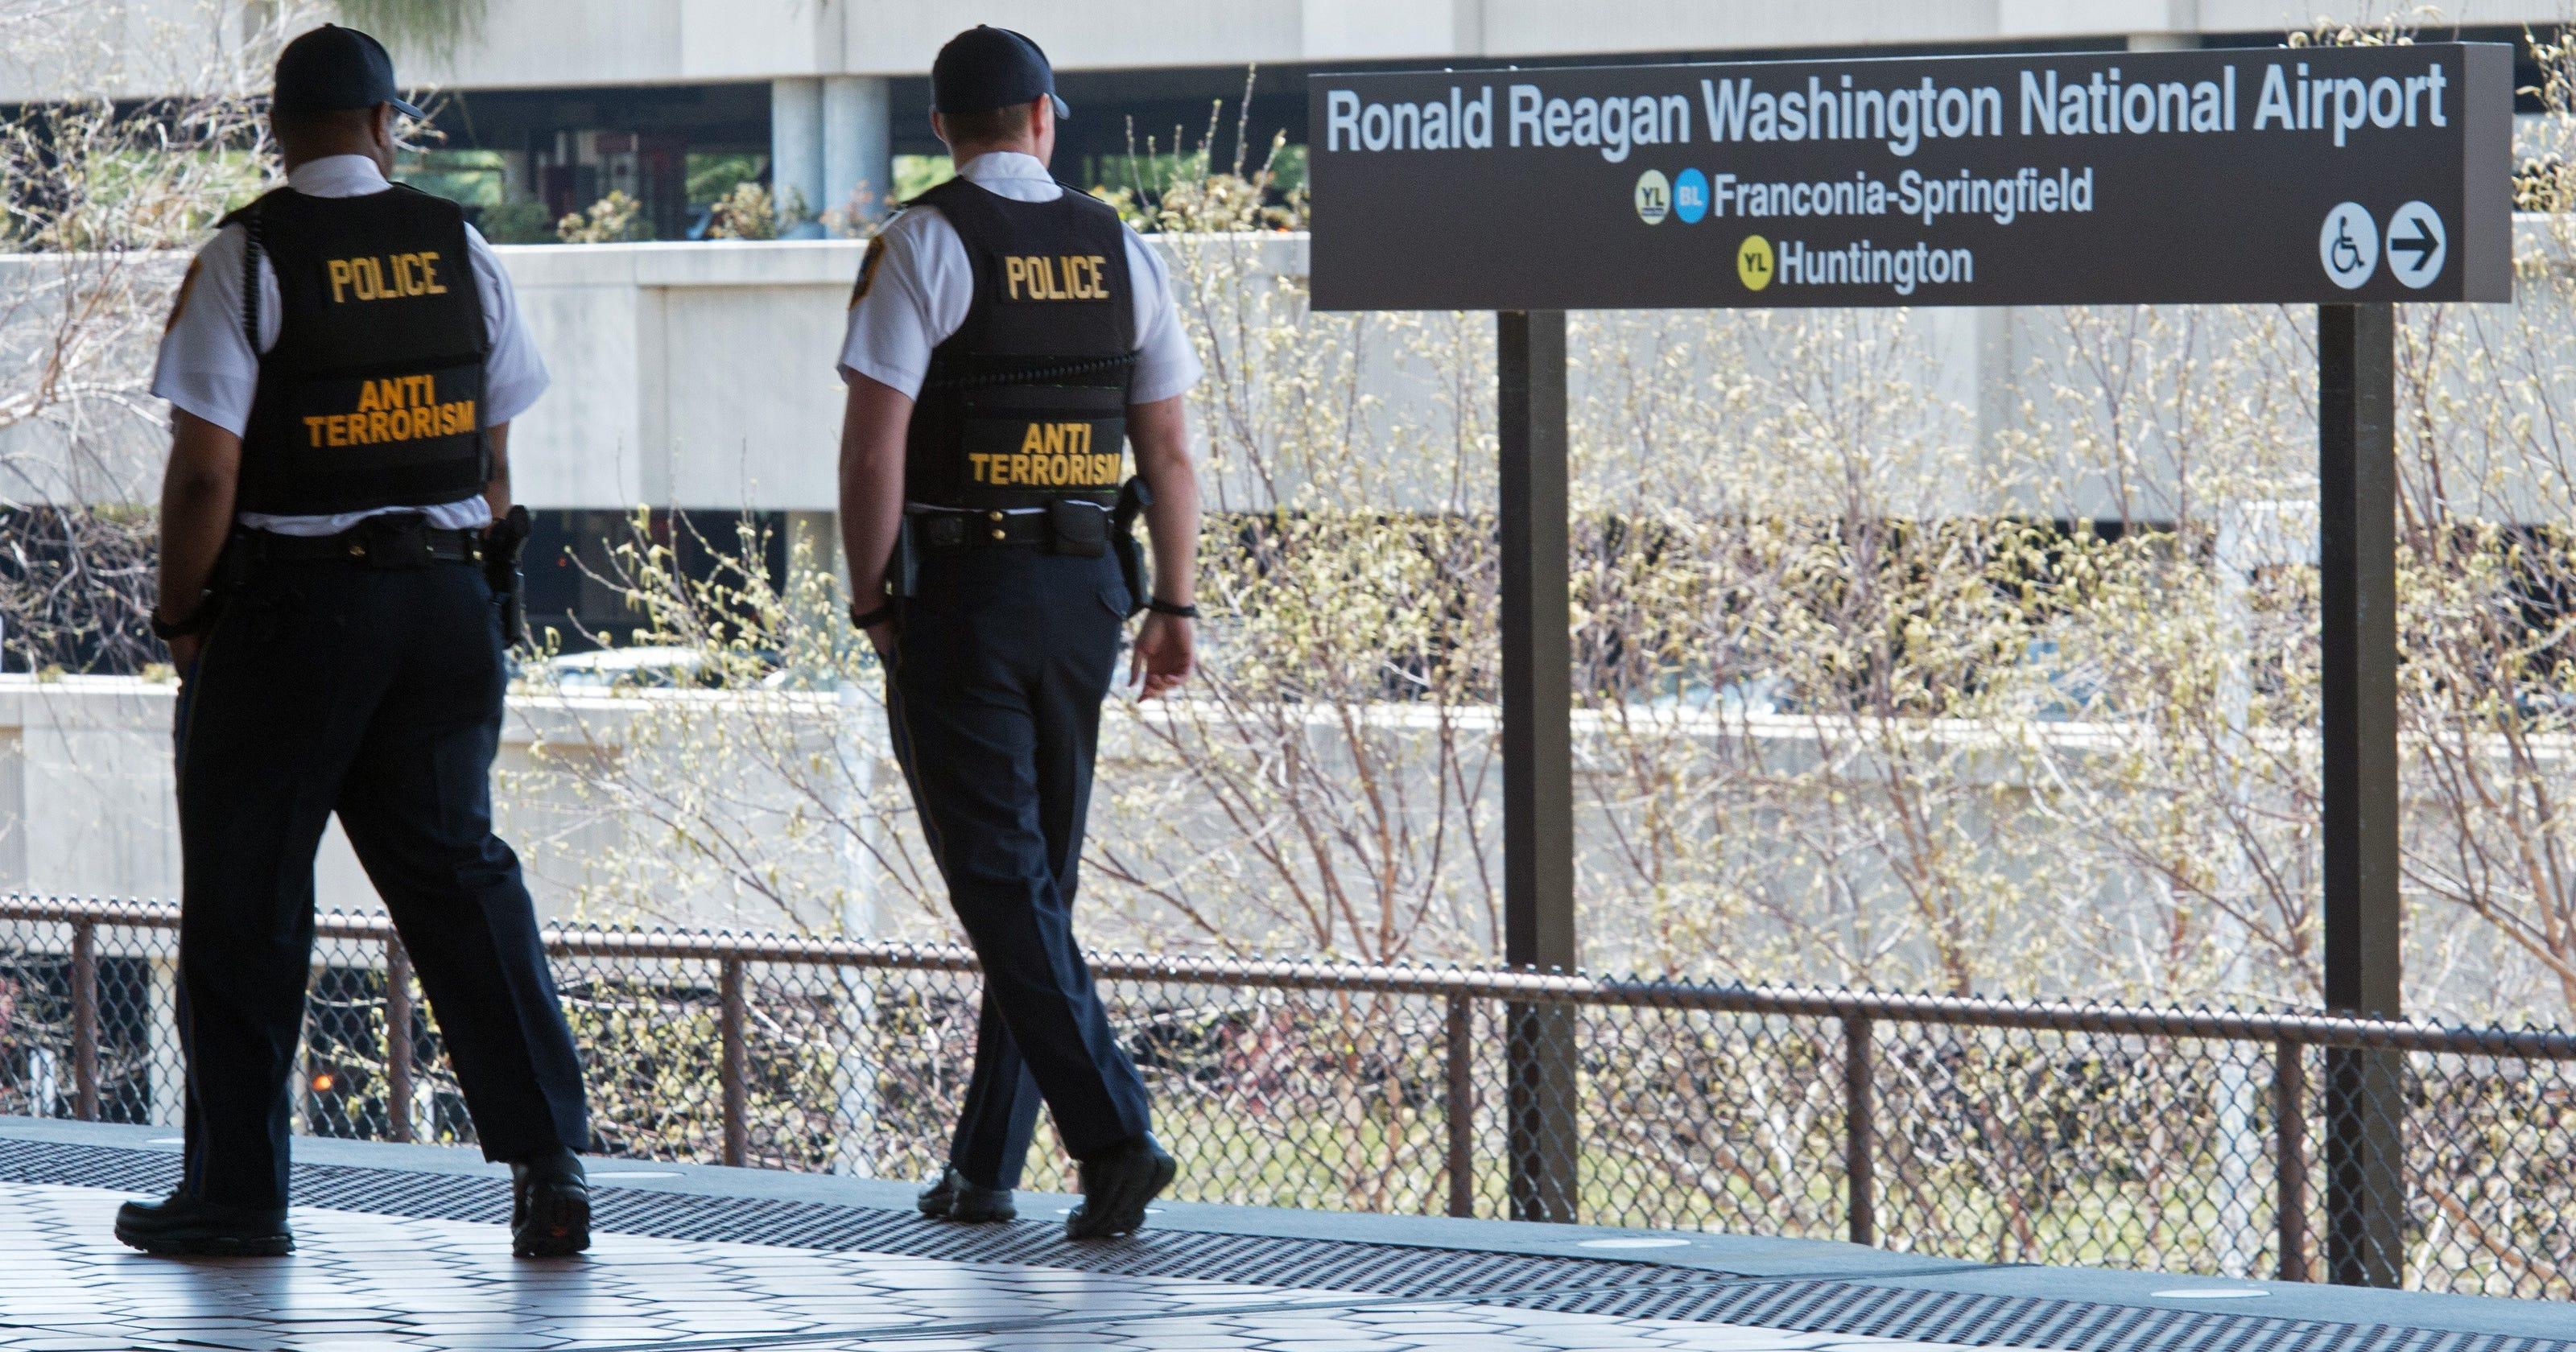 Metro Increasing Security After Paris Attacks